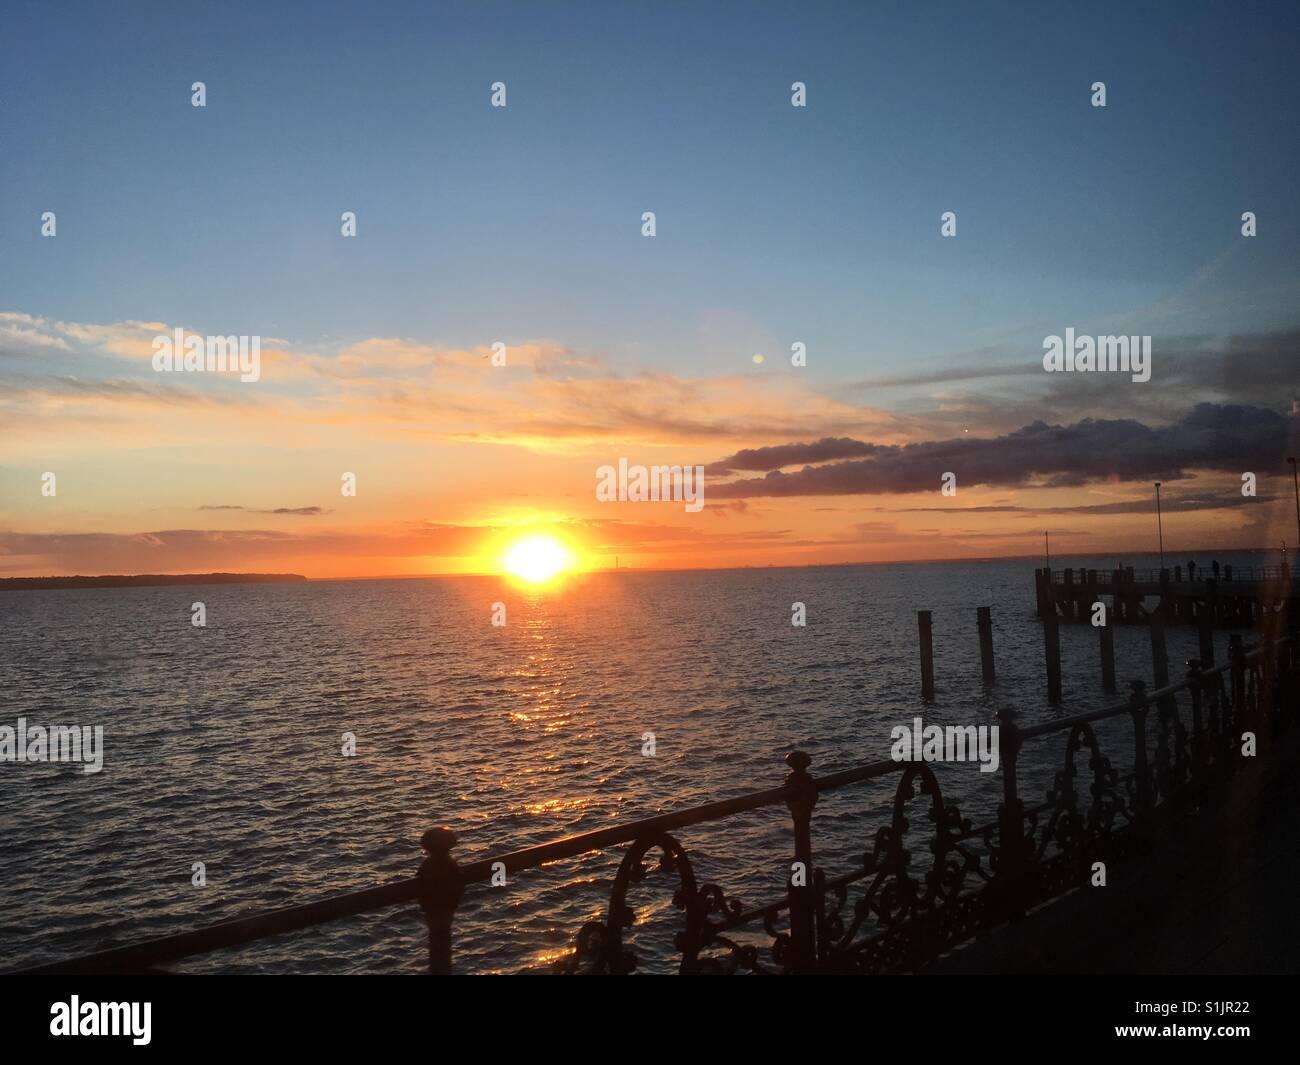 Ryde Pier Sunset - Stock Image